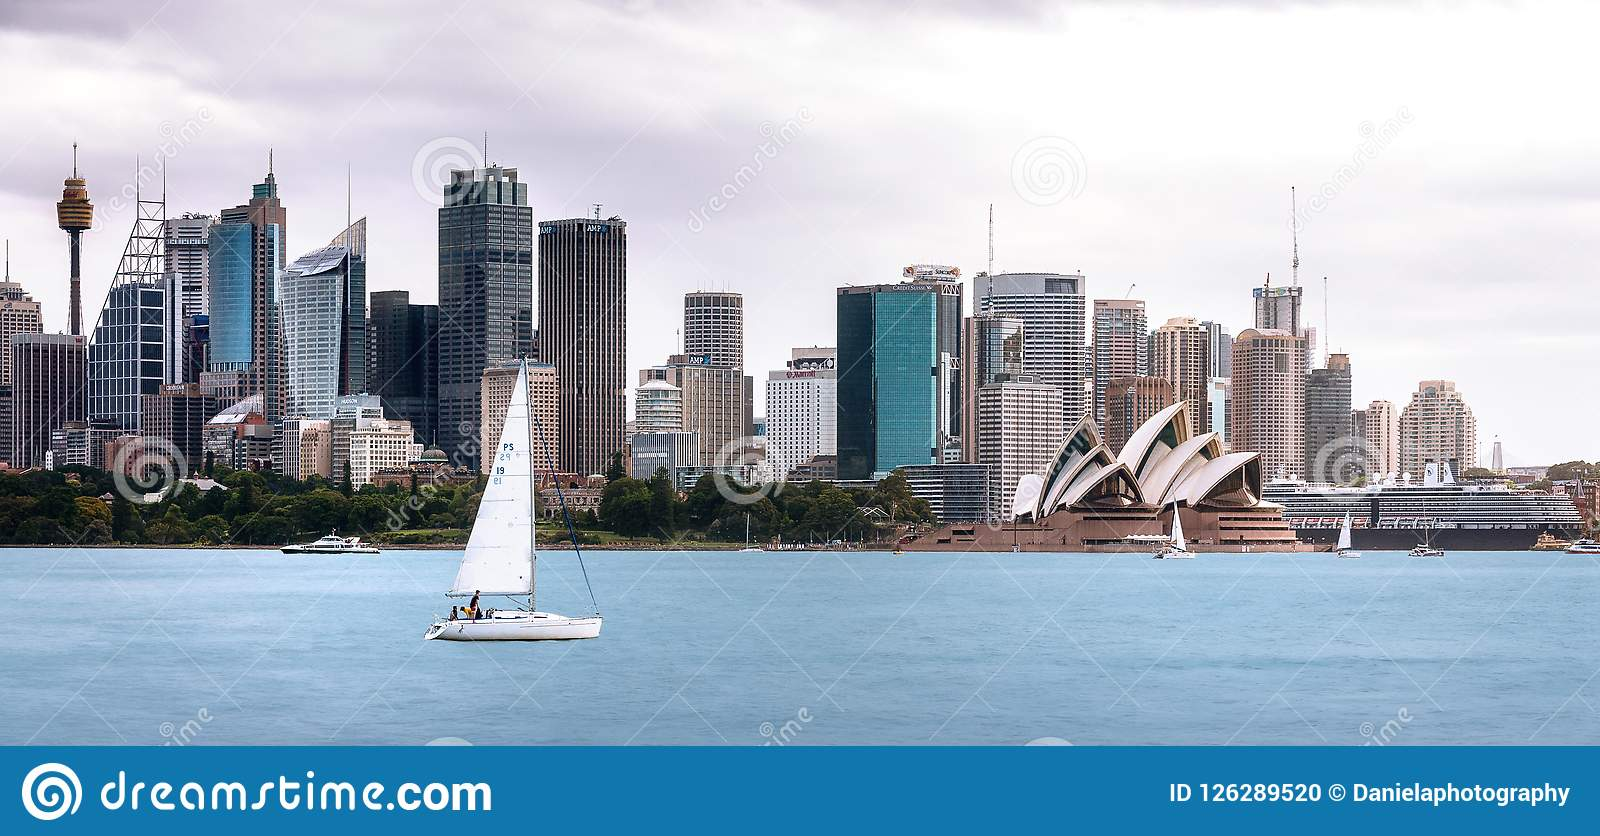 A sailboat in Sydney Harbour, Australia.